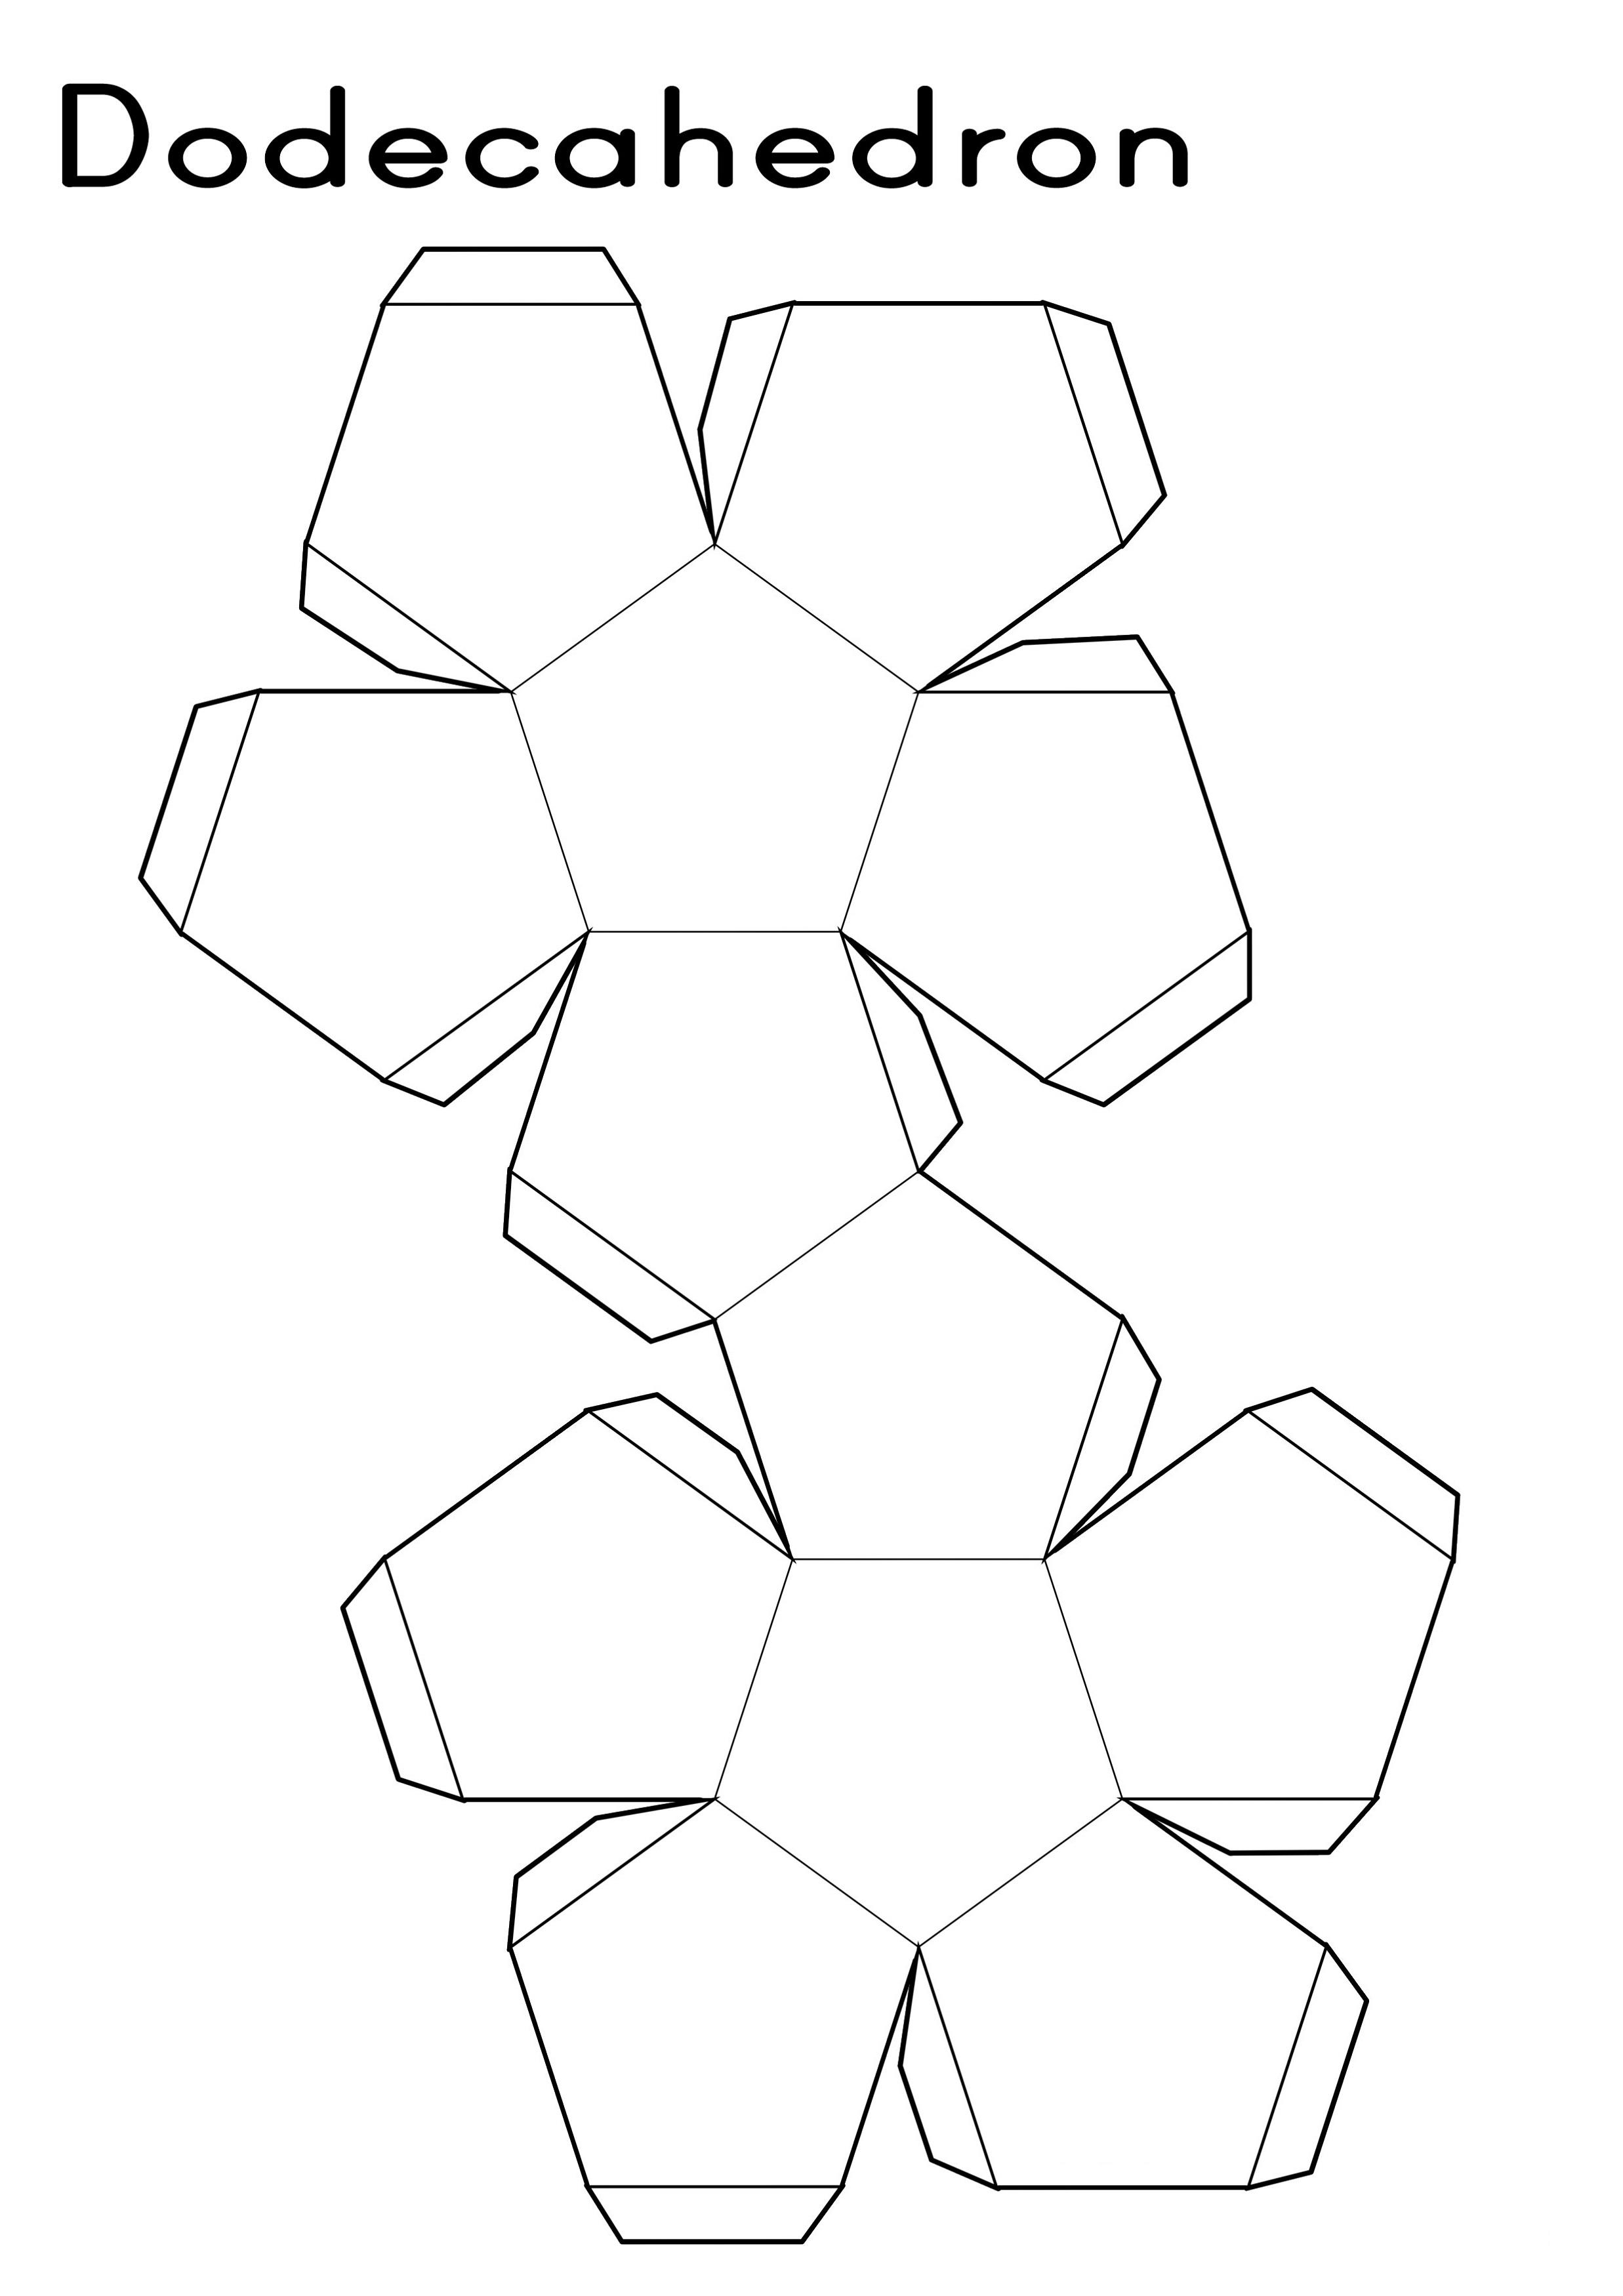 Agile image with printable nets